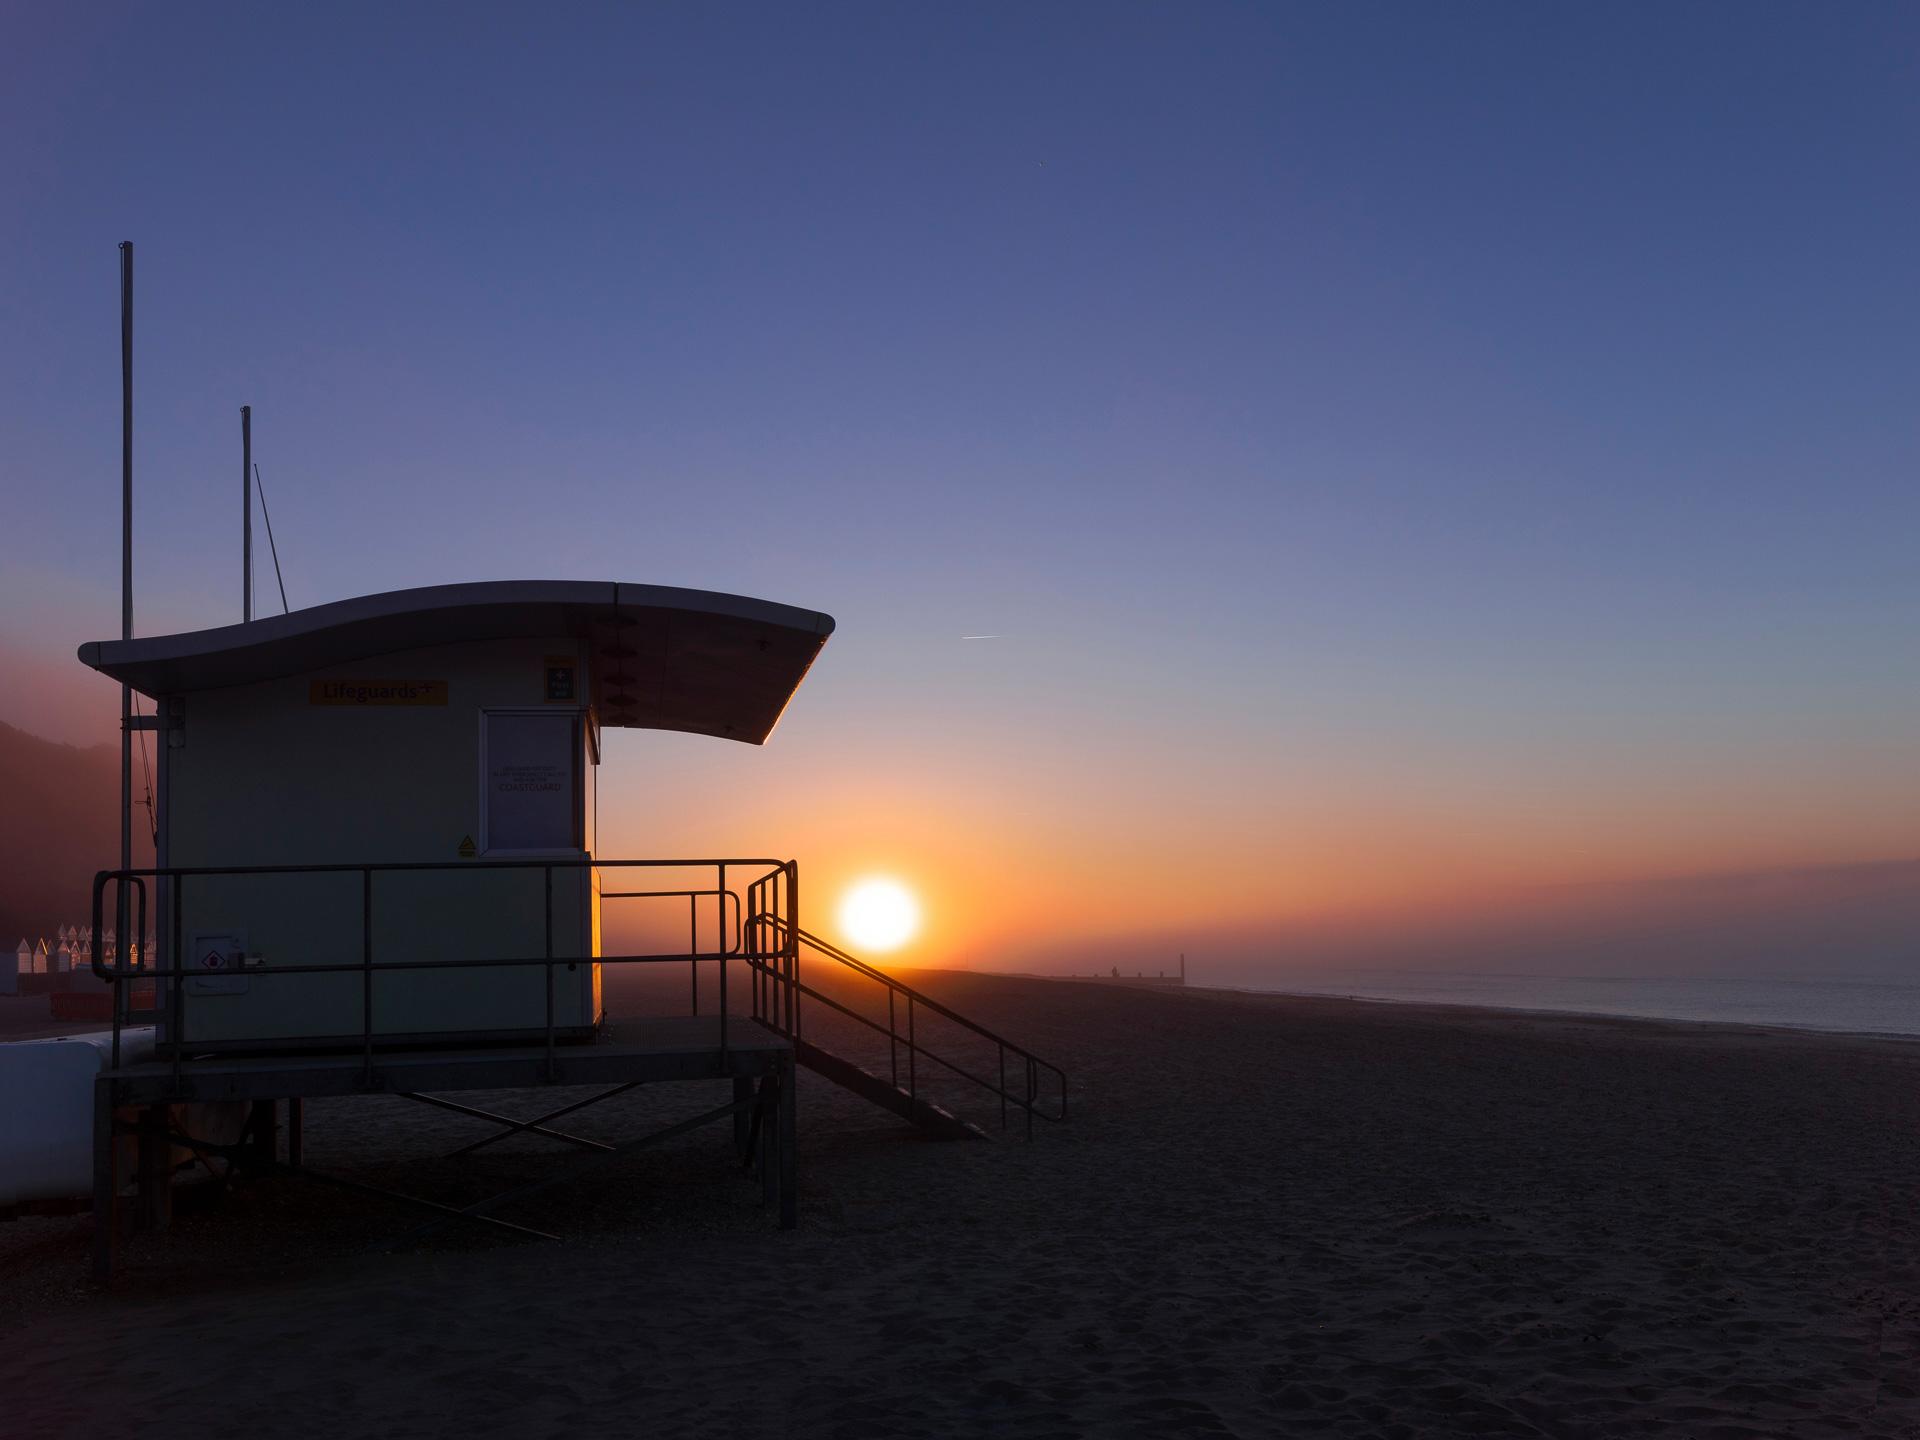 Sun slowly rising behind a lifeguard hut on boscombe beach